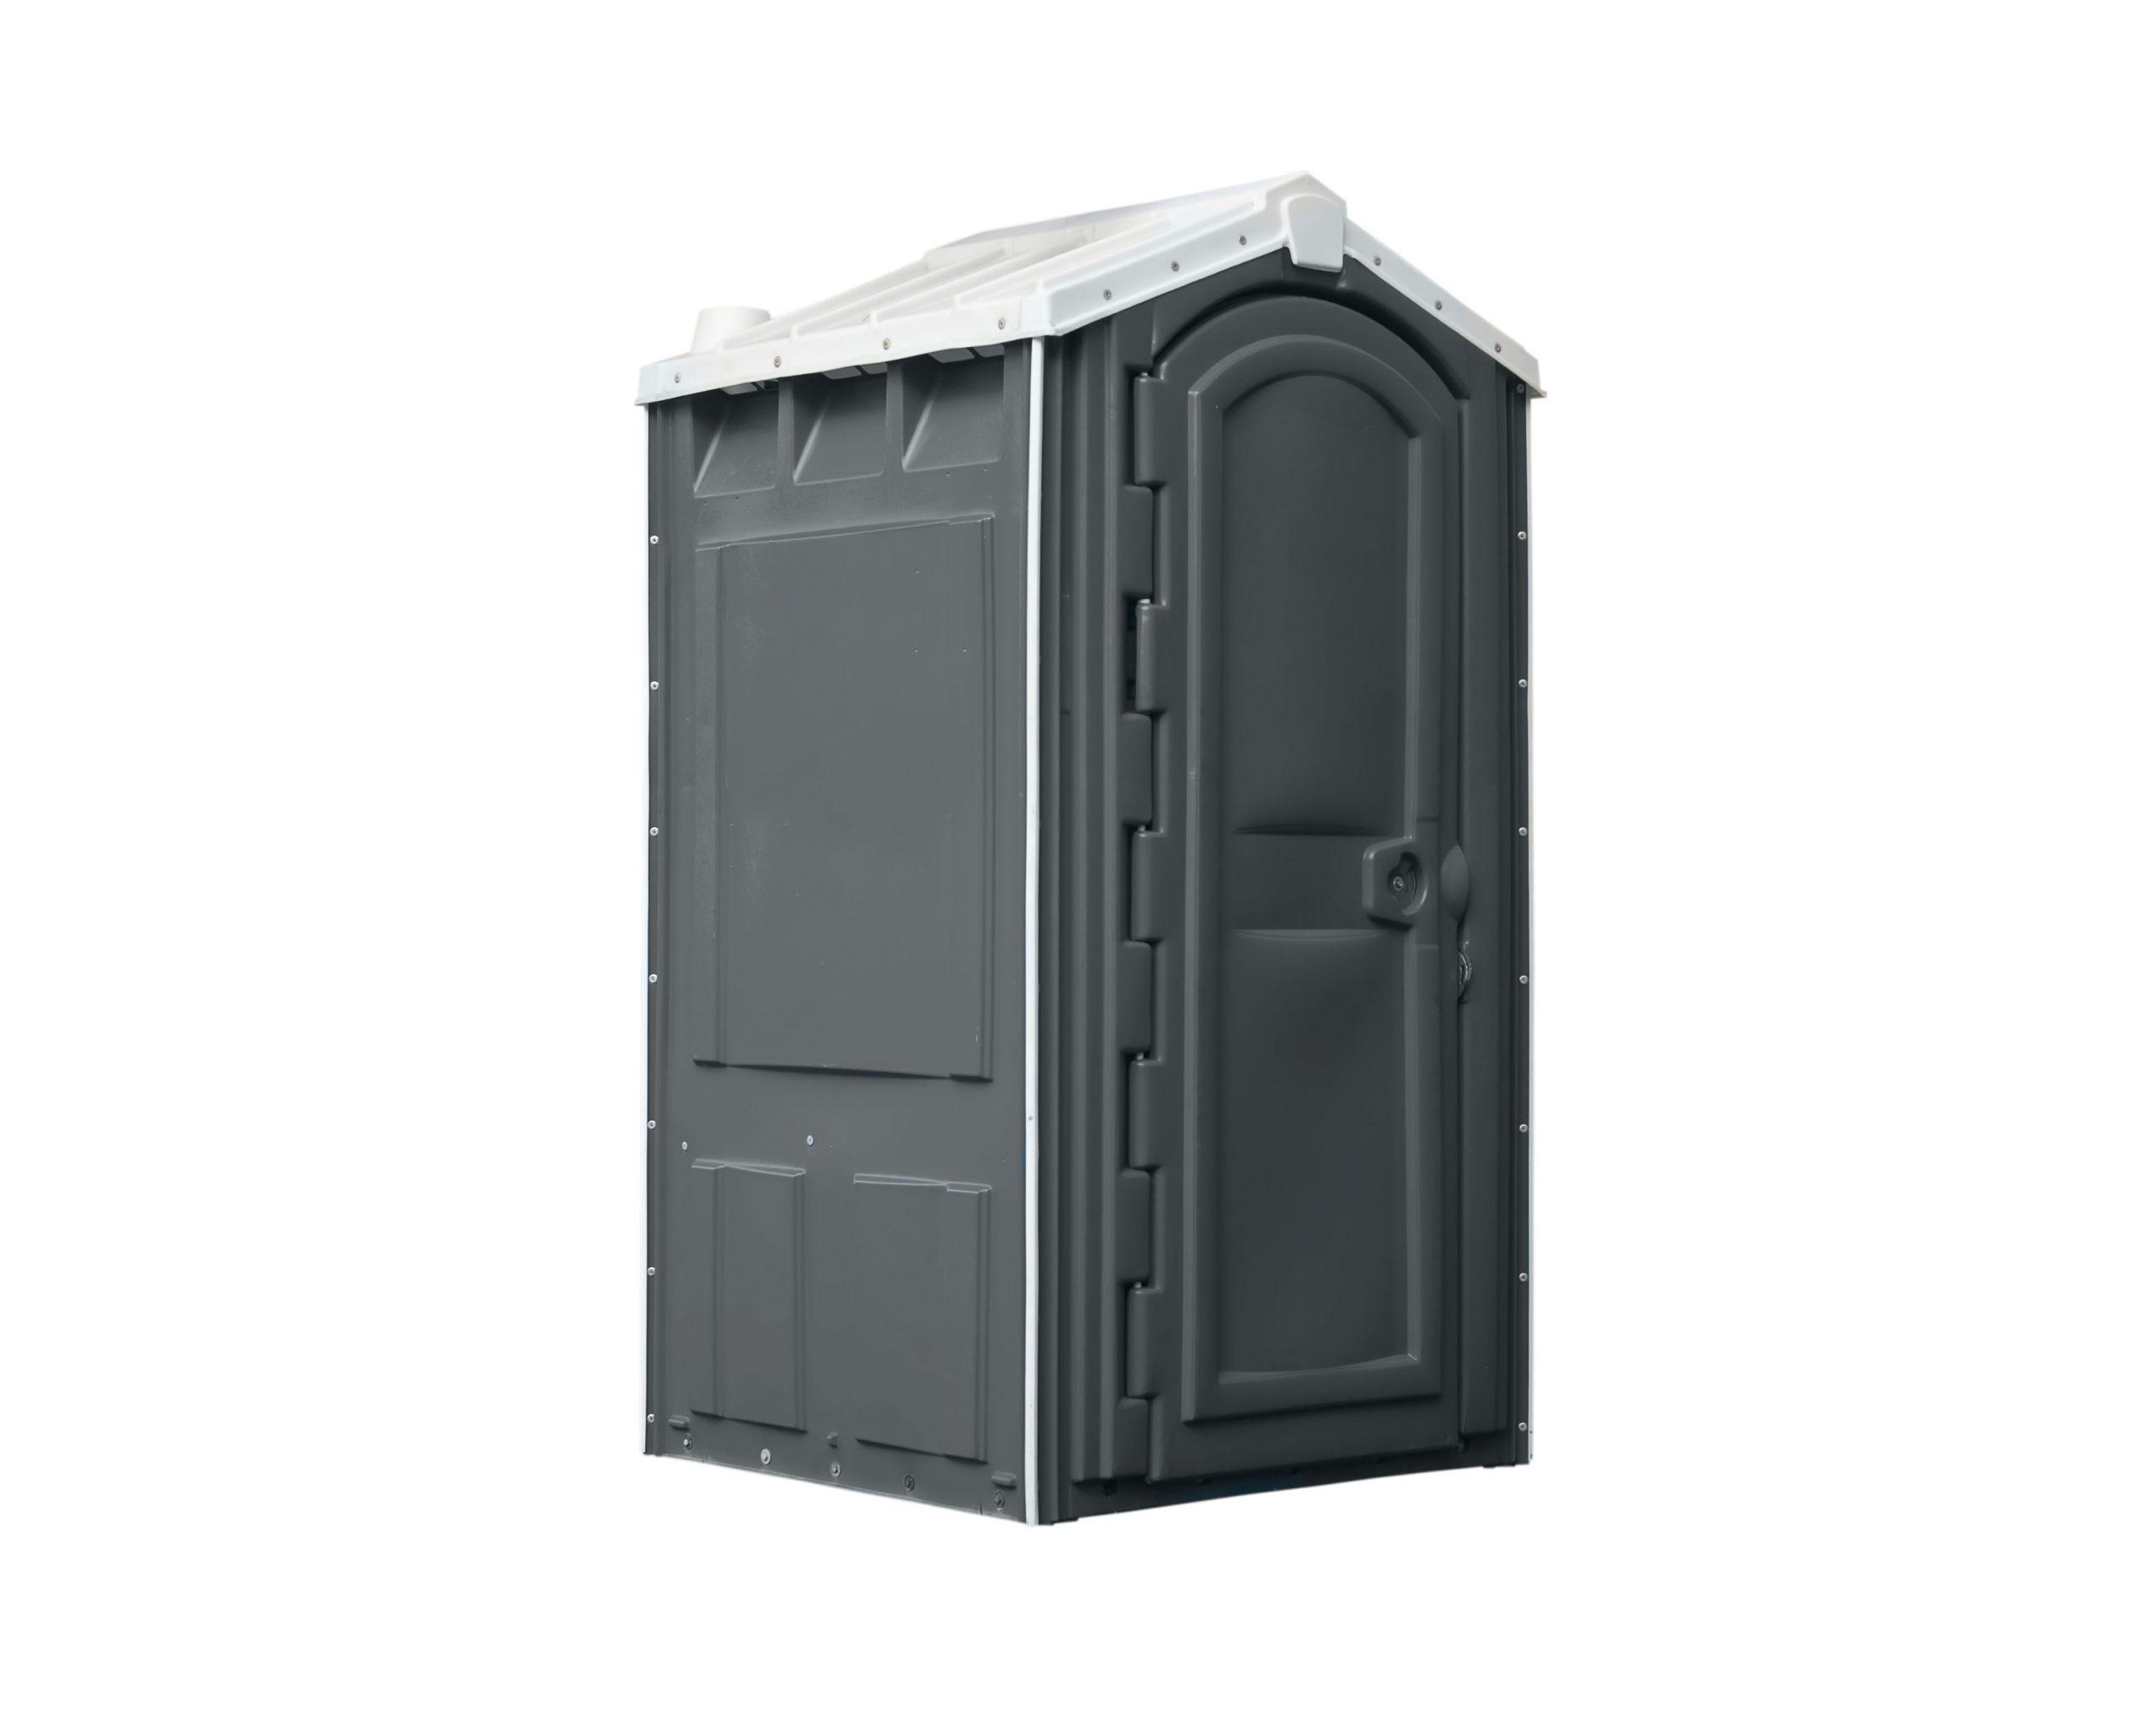 Saubermacher Toilette mieten1